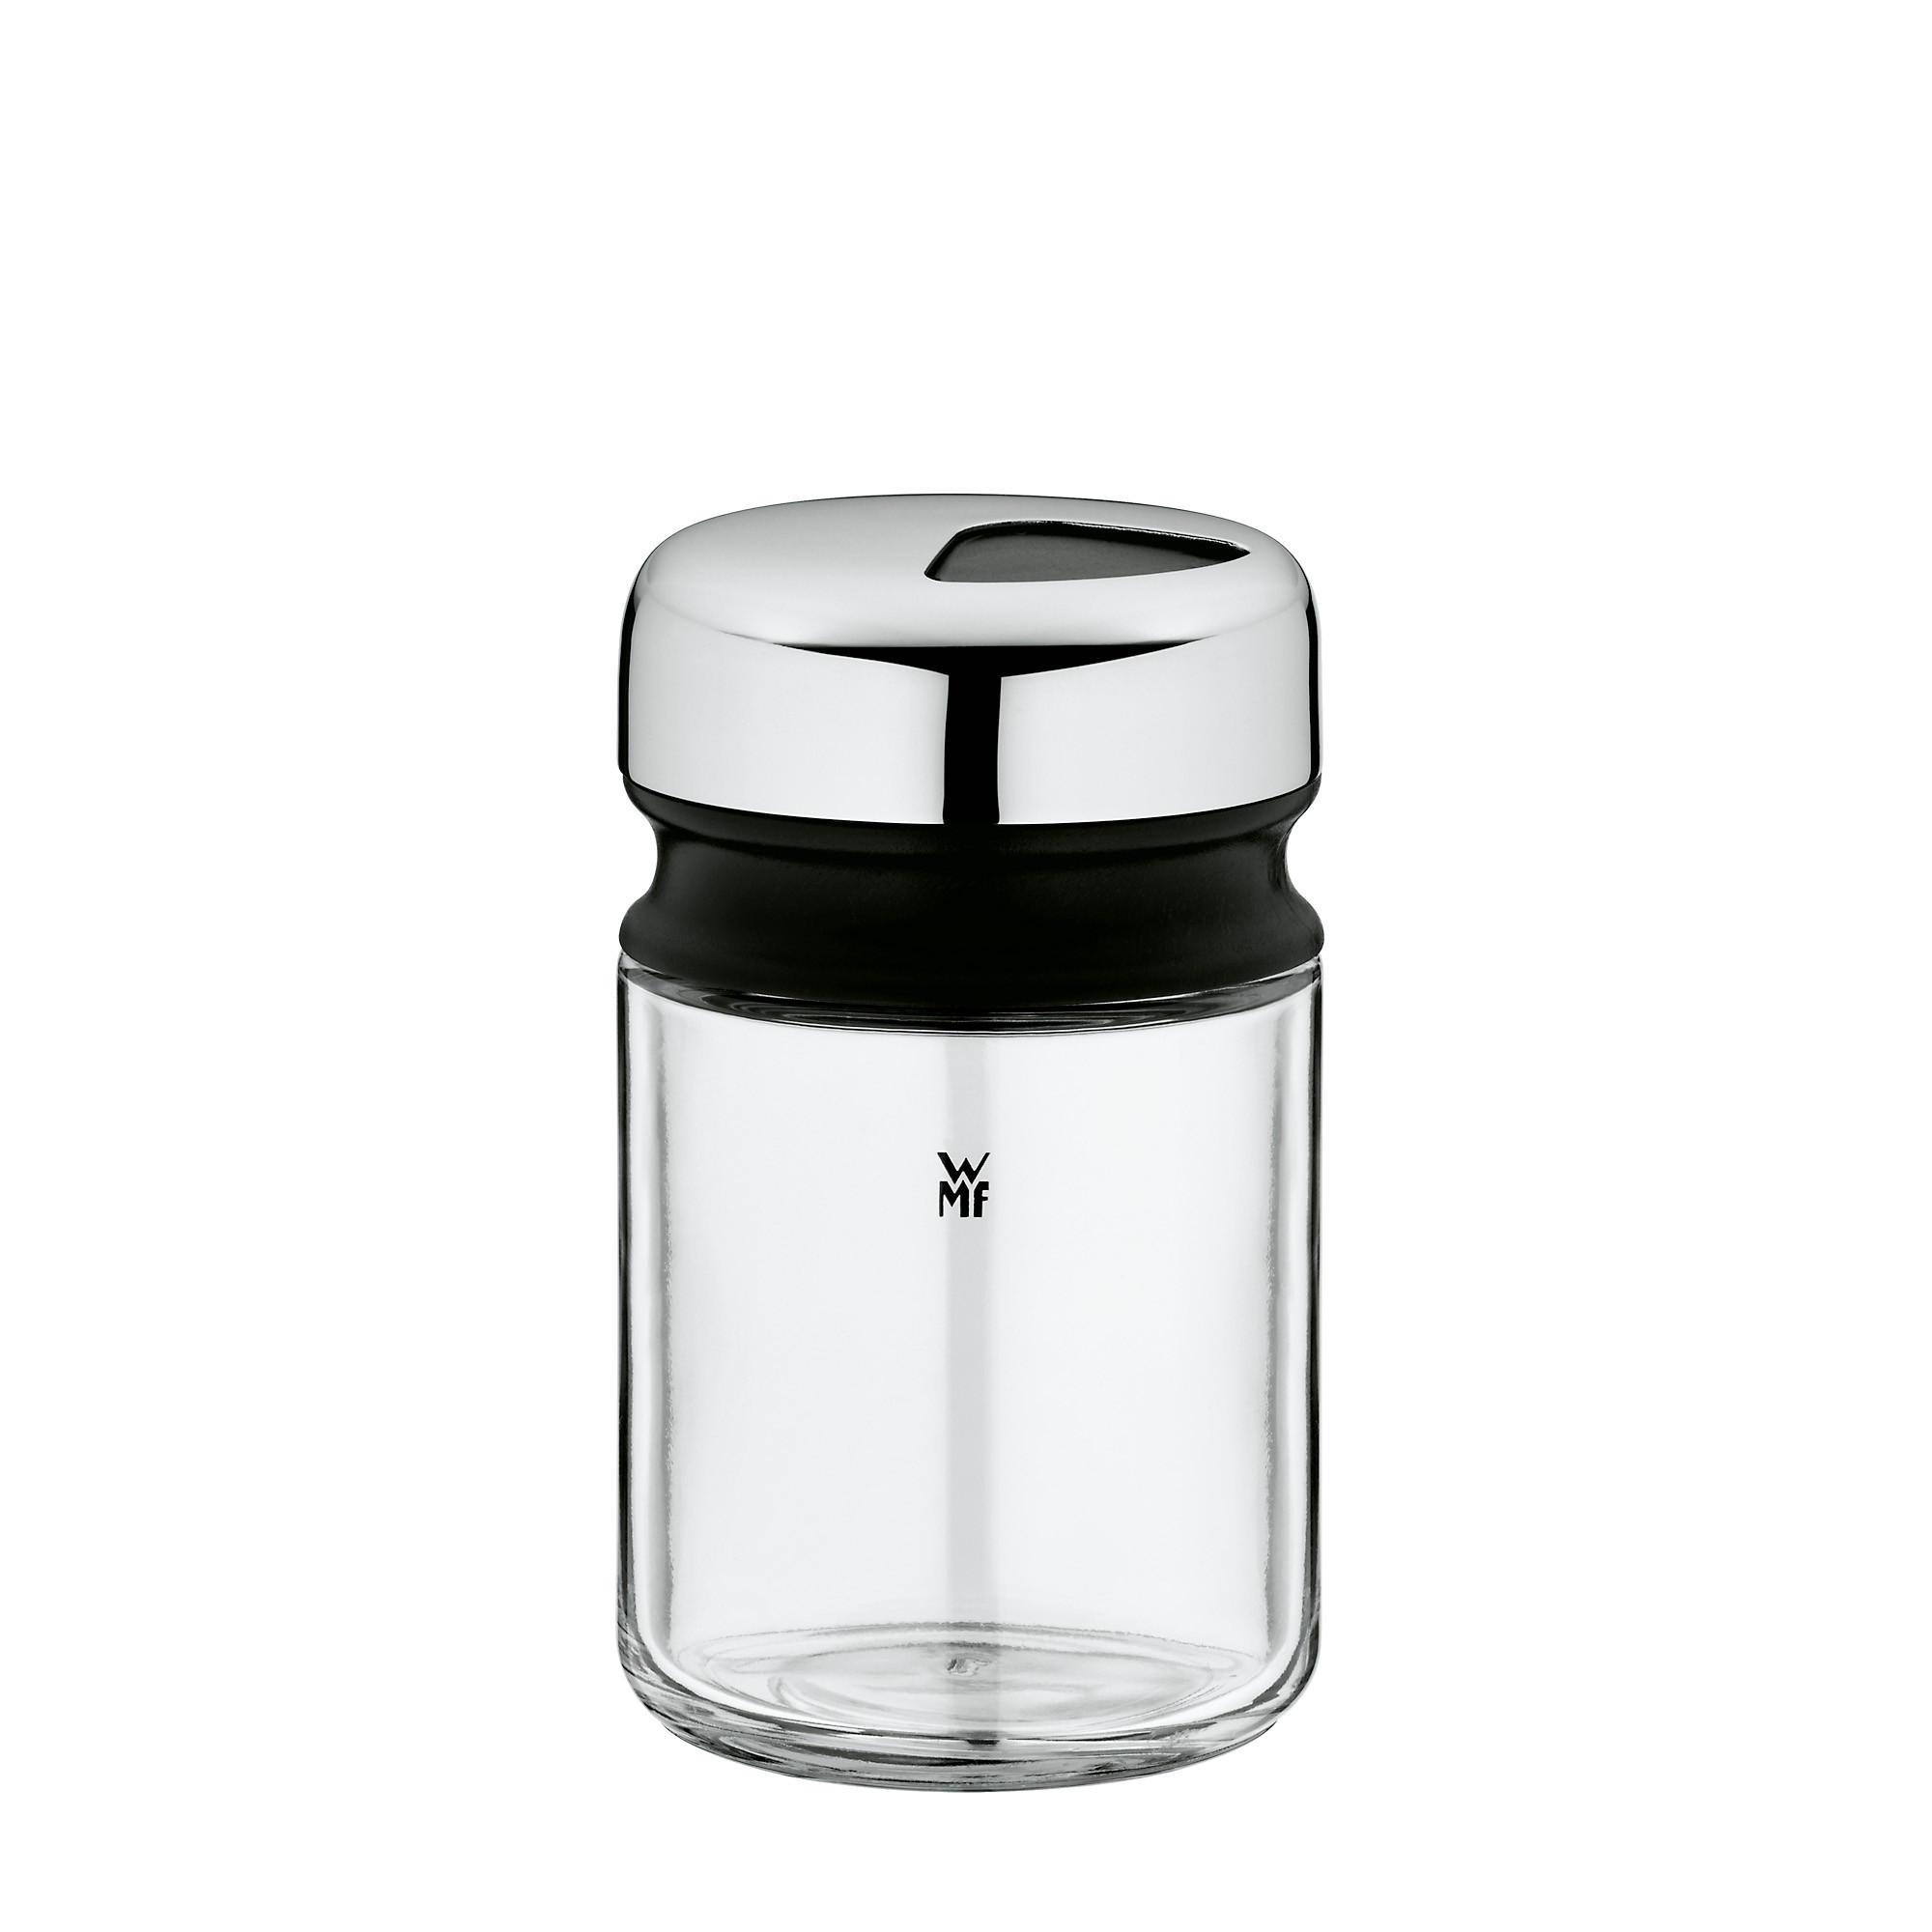 Universalstreuer - Basics, Glas/Keramik (5,5/9,5cm) - WMF